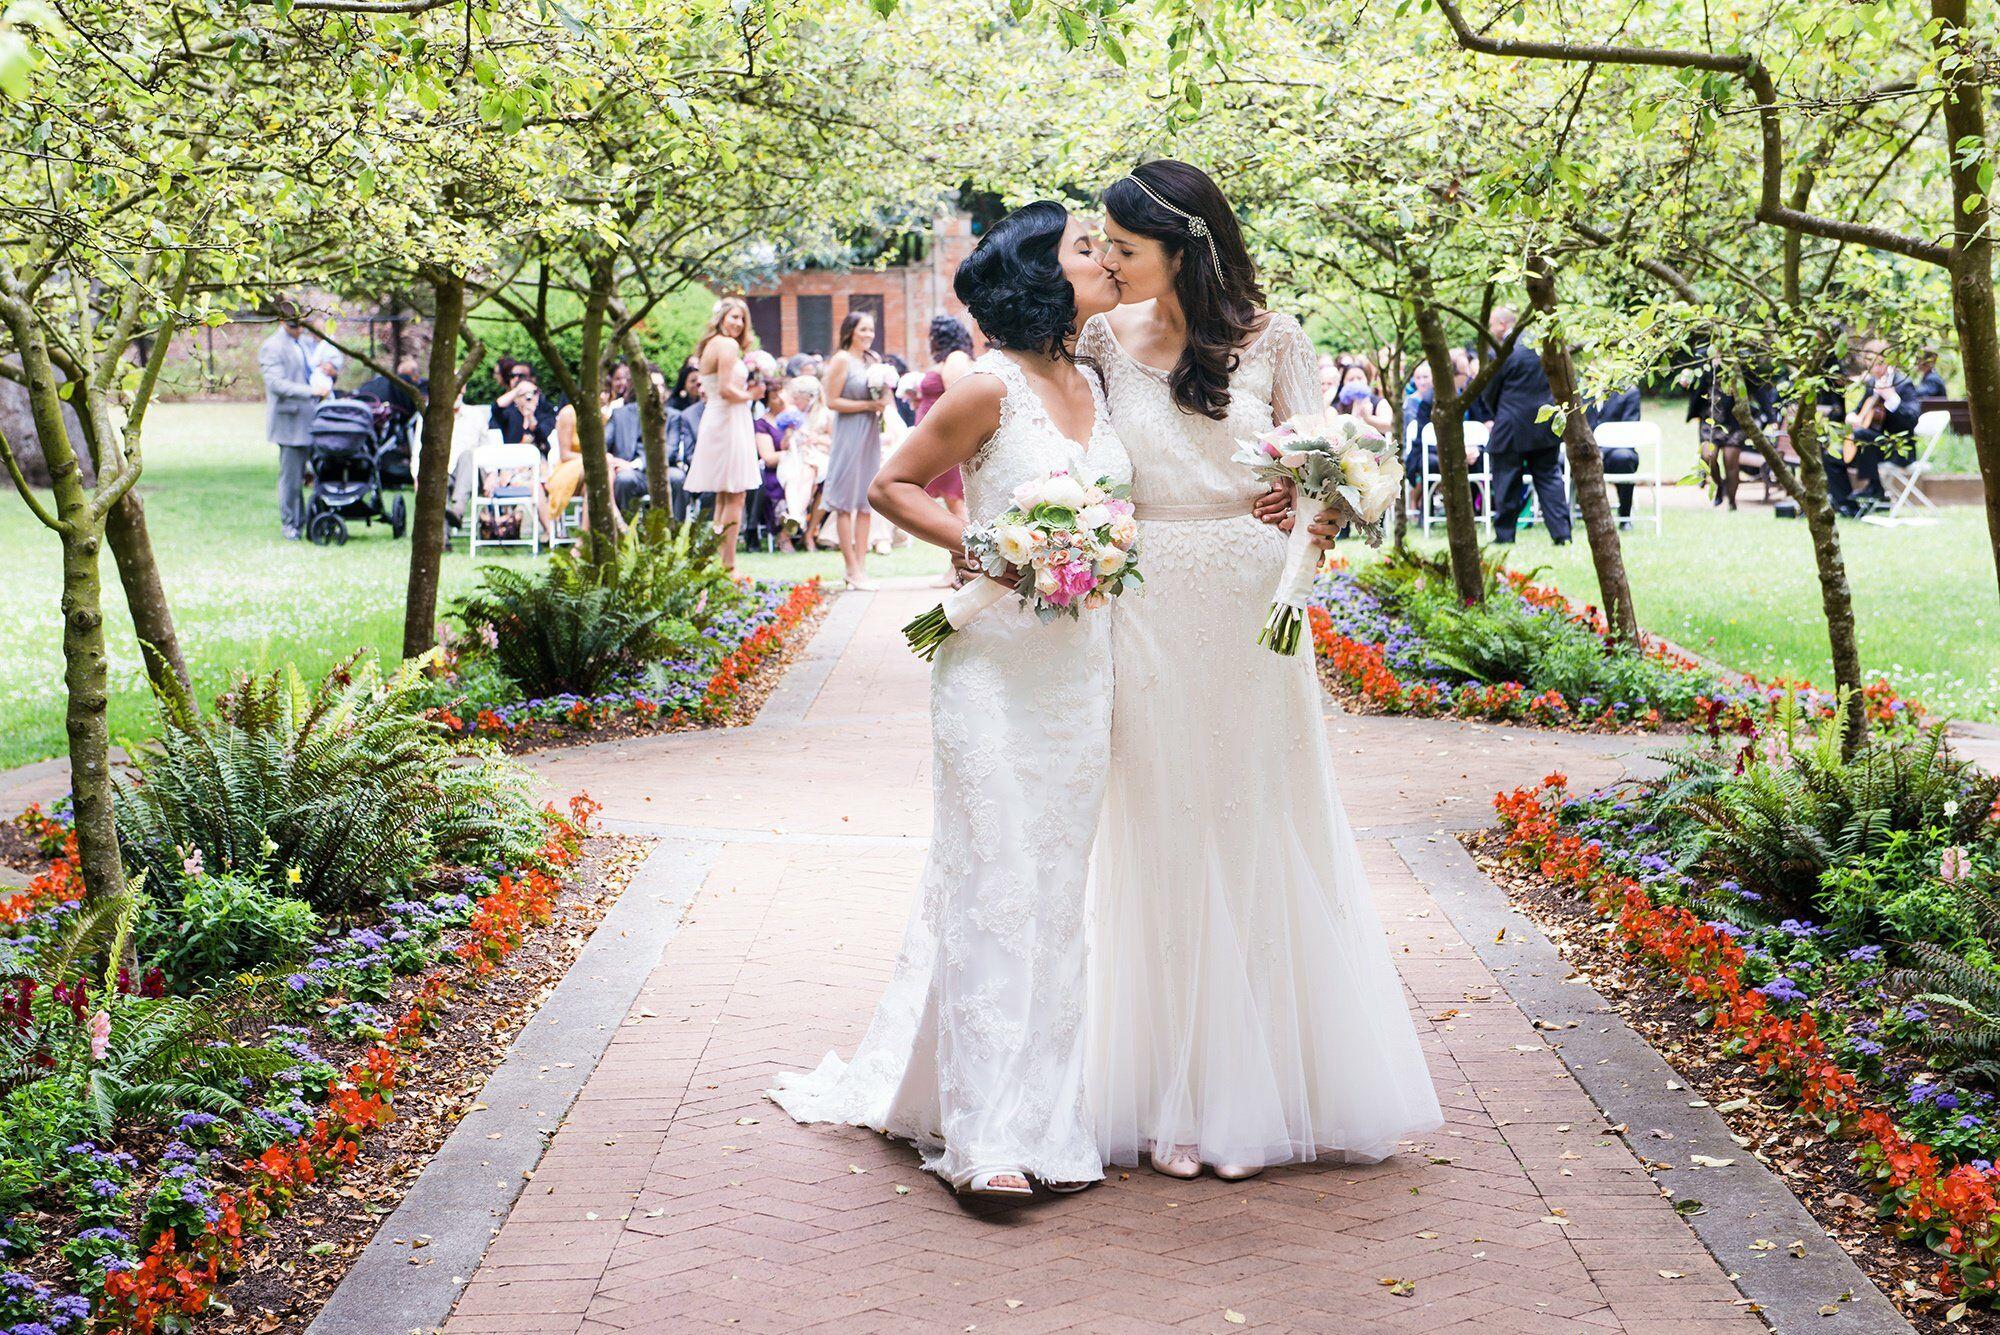 Real Weddings San Francisco: A Vintage-Inspired Same-Sex Wedding In San Francisco